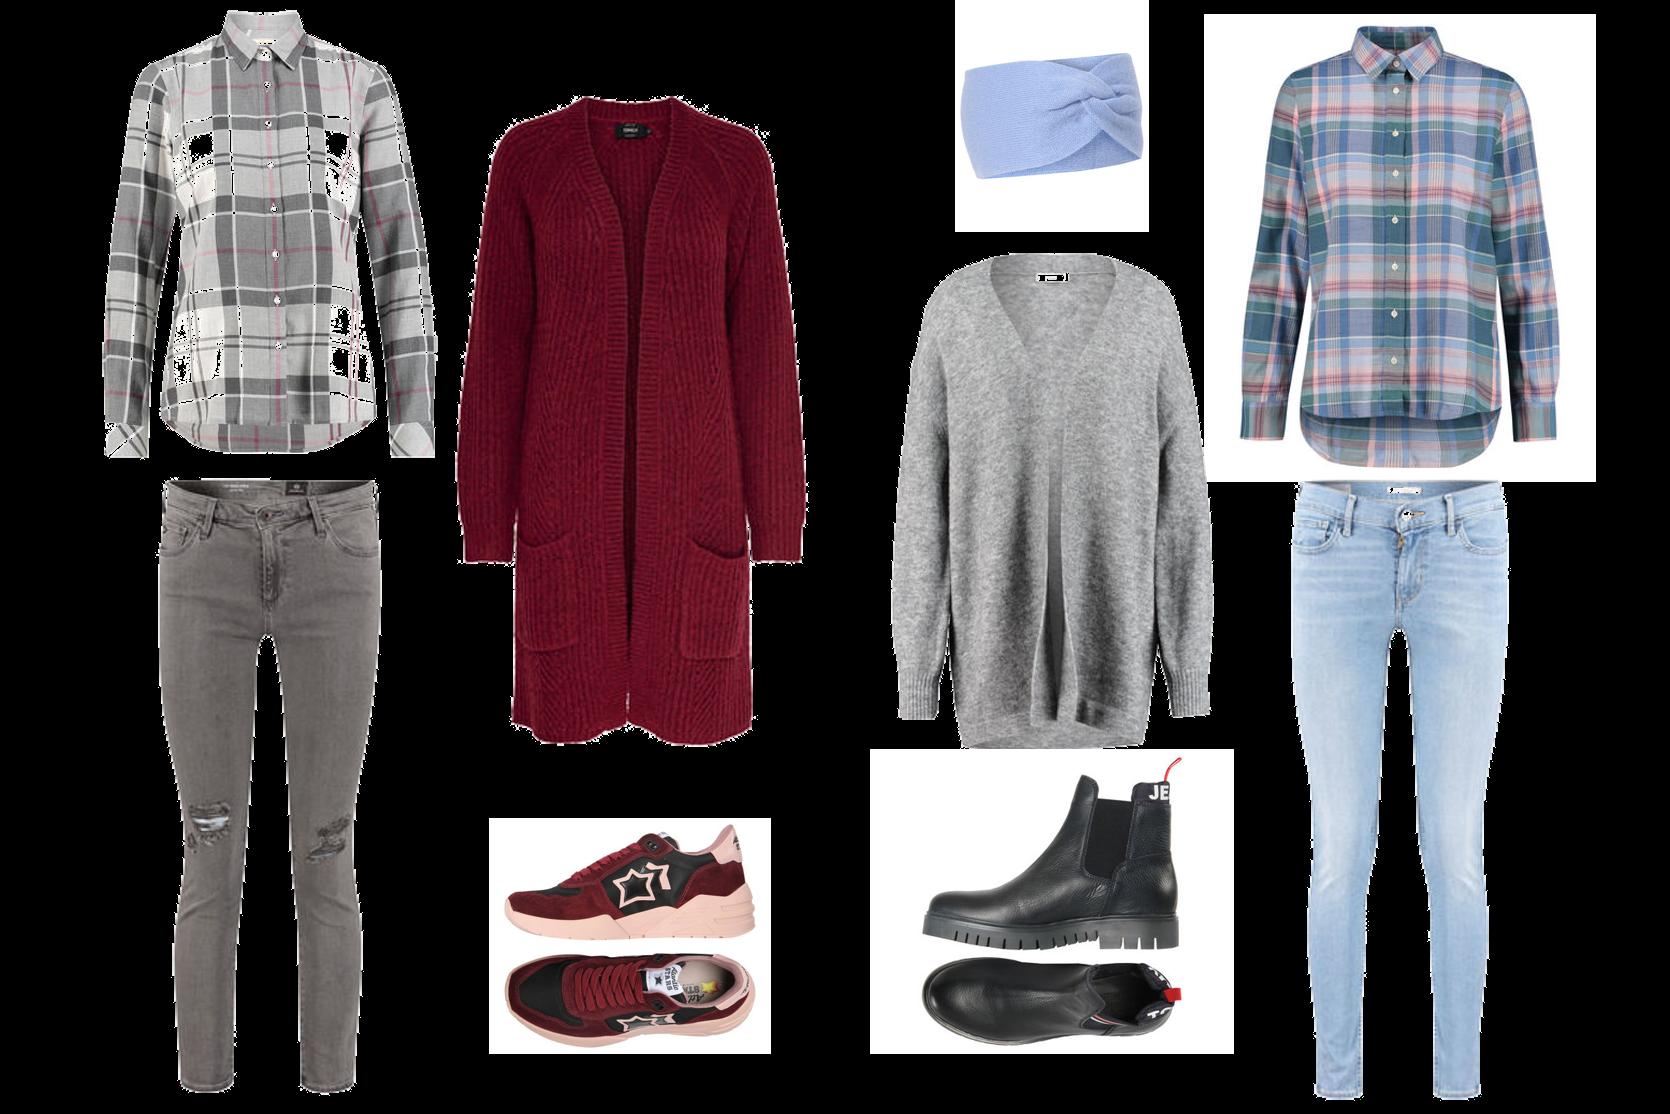 Back to Basic 5 Basic Outfits, die diesen Herbst alles